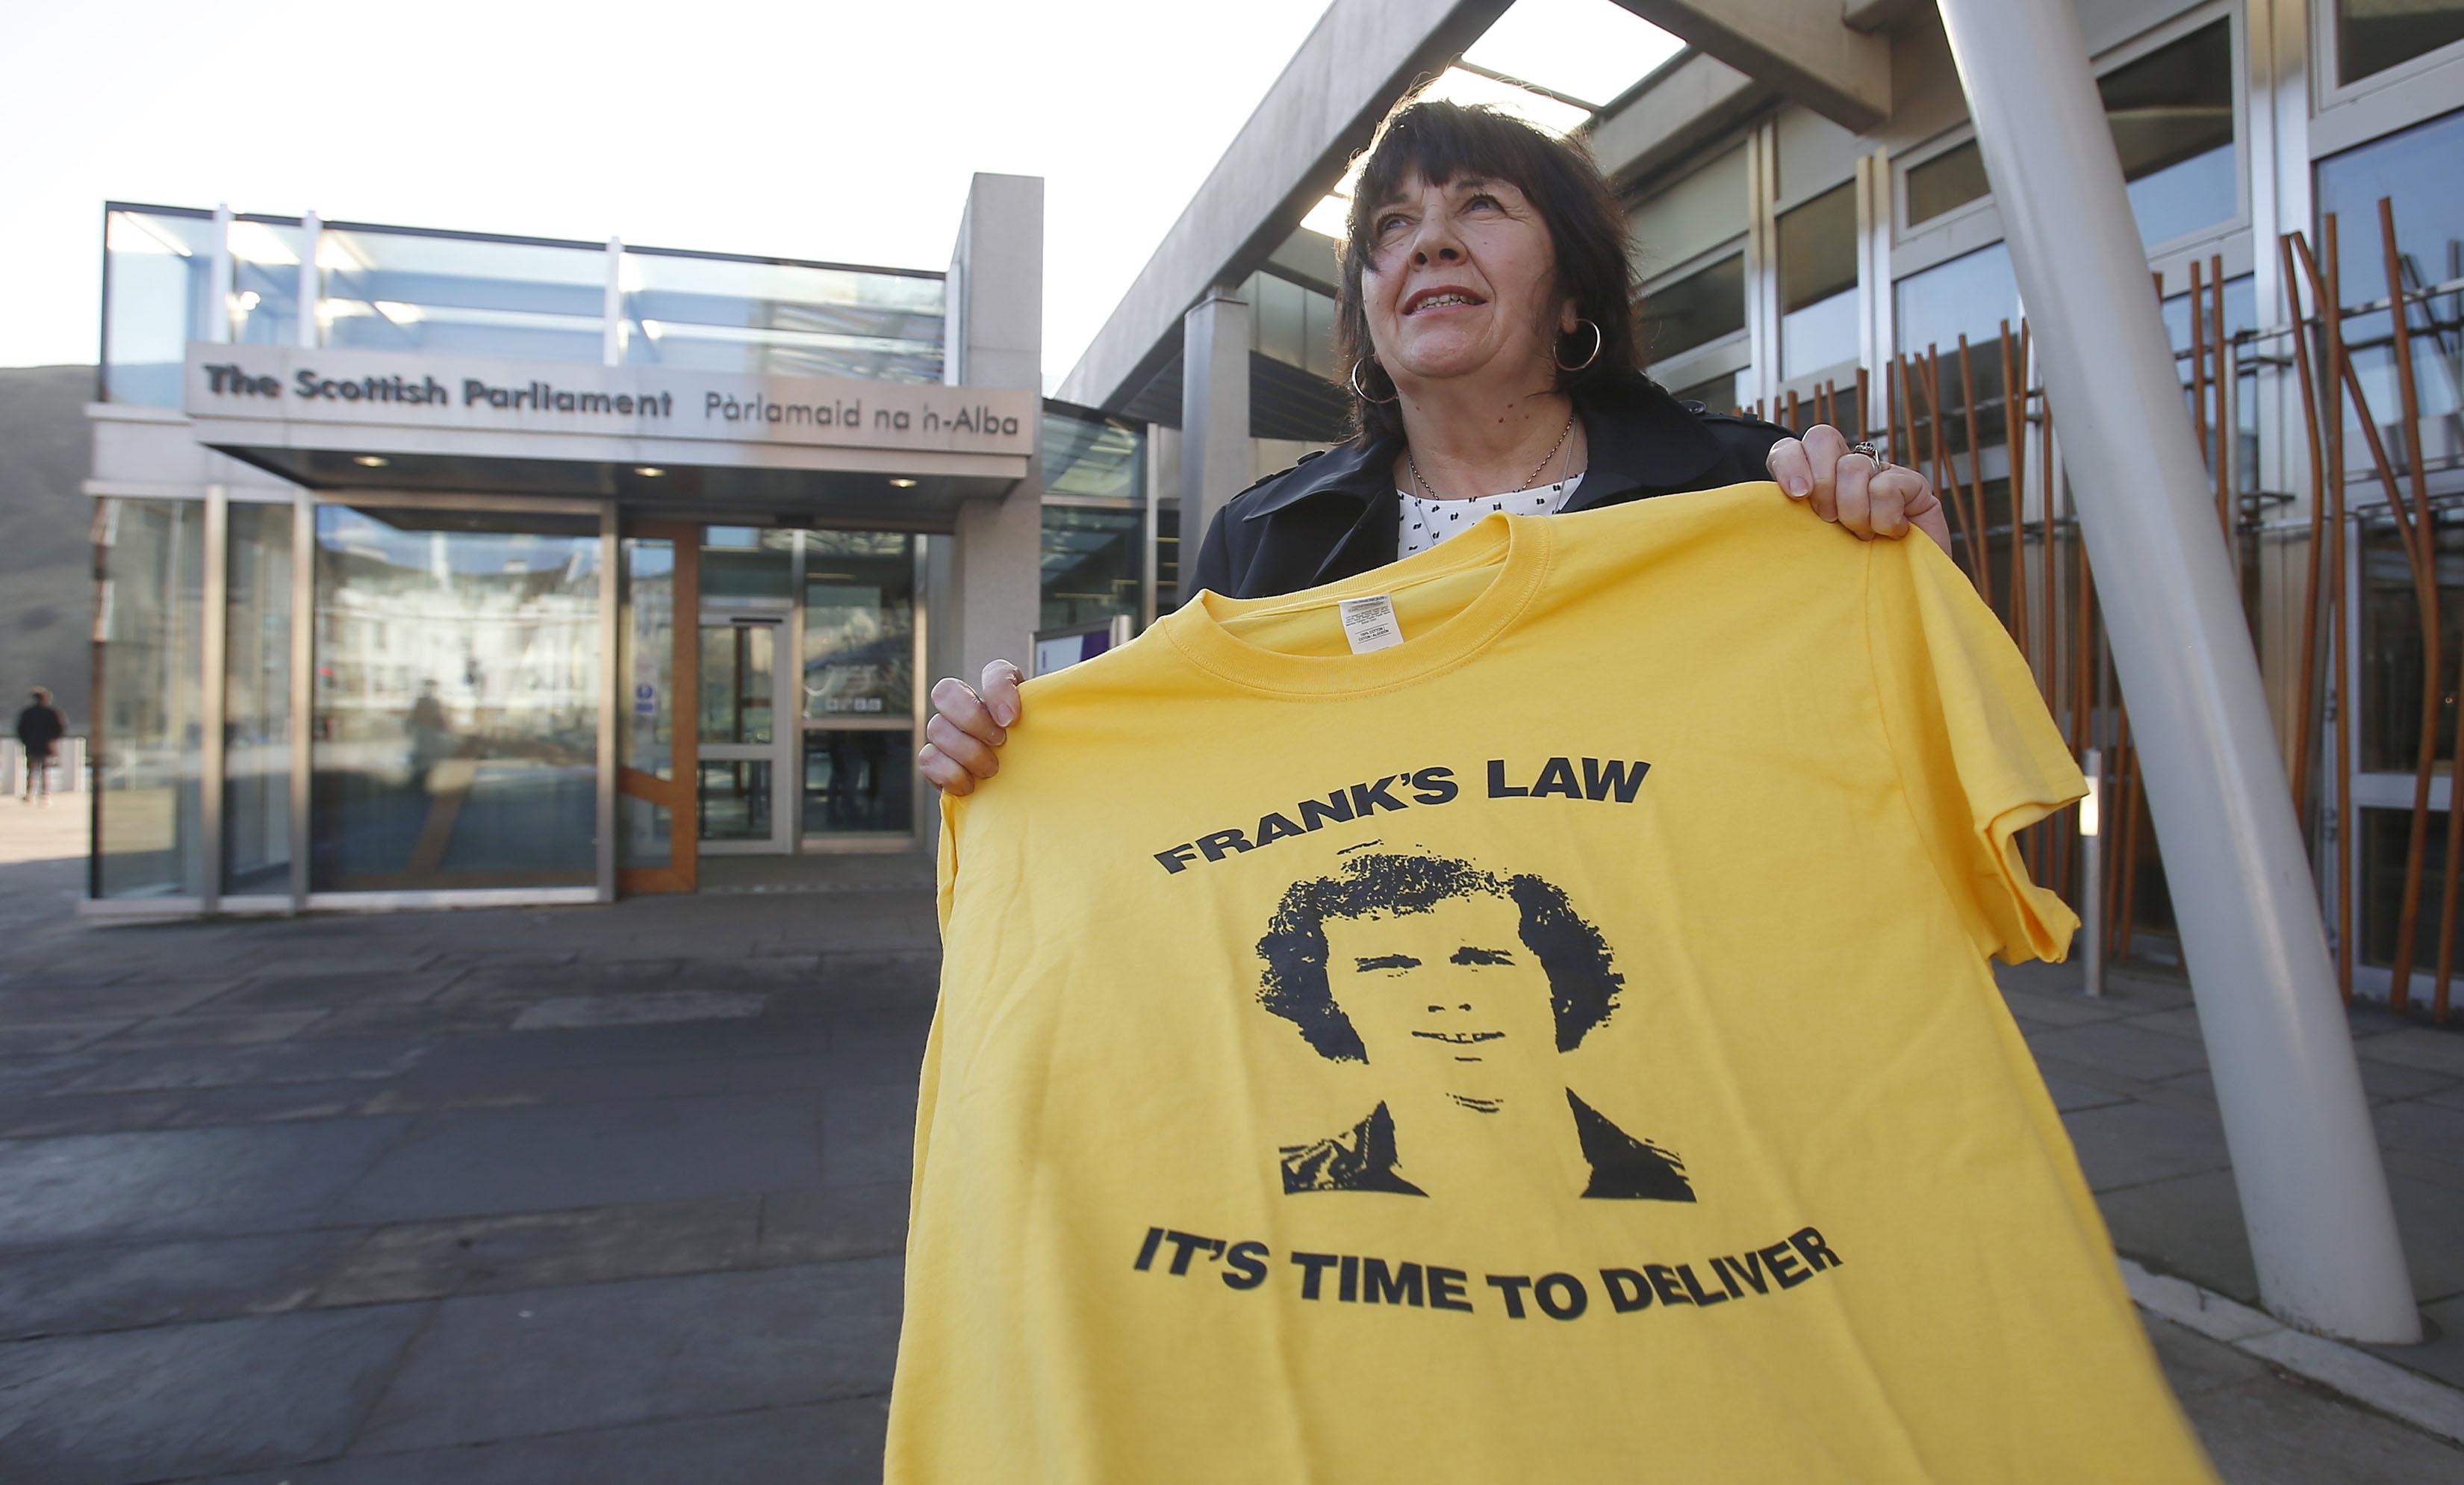 Amanda Kopel campaigning for Frank's Law.